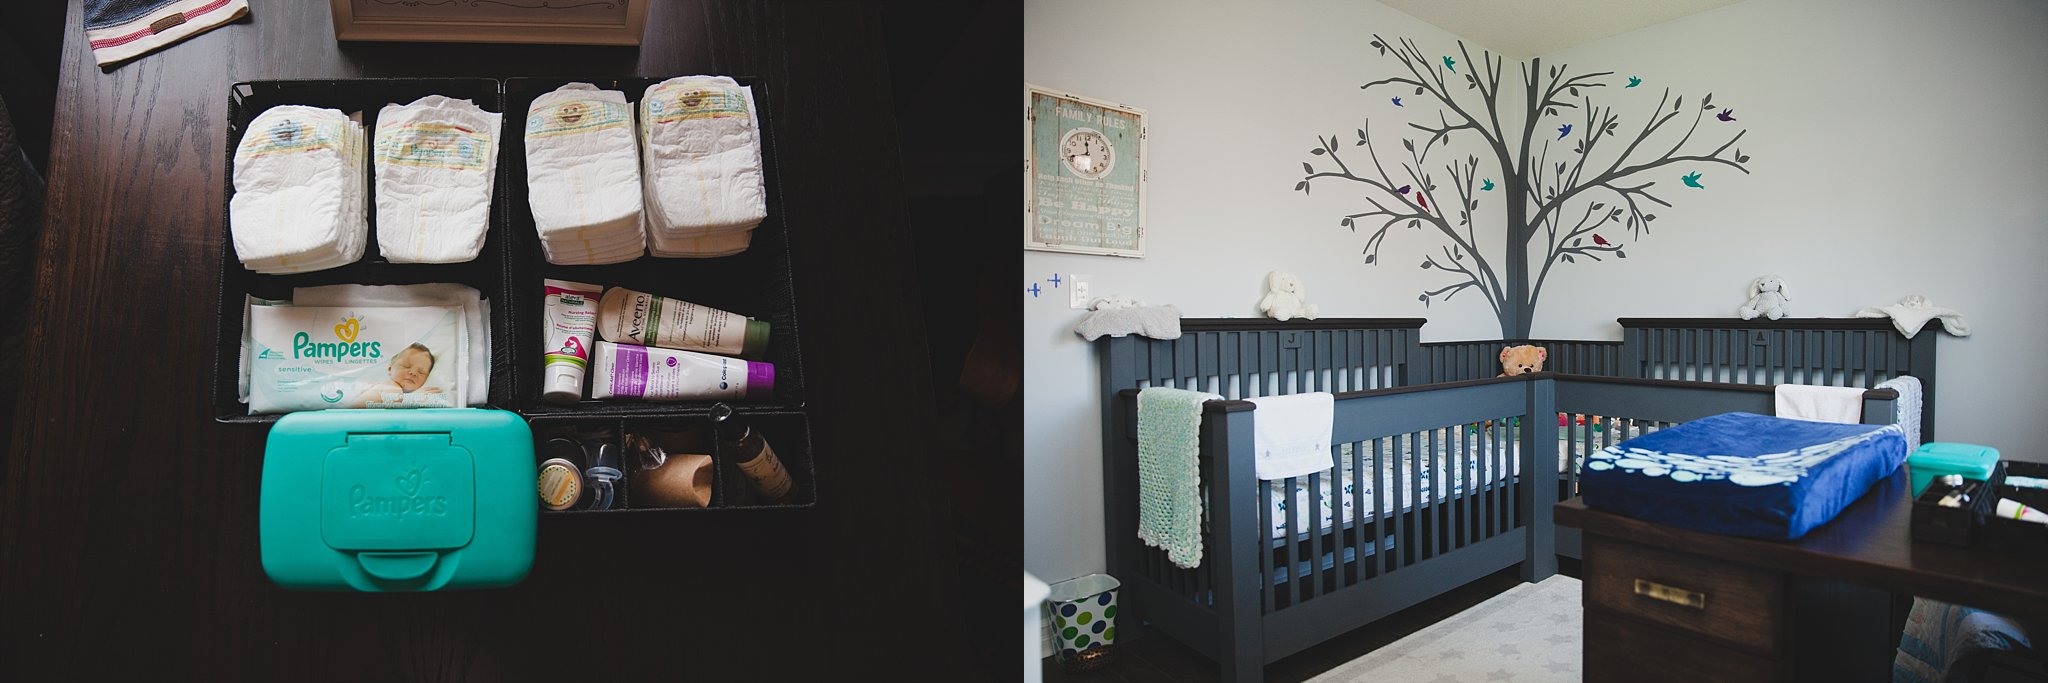 Custom made crib for twins